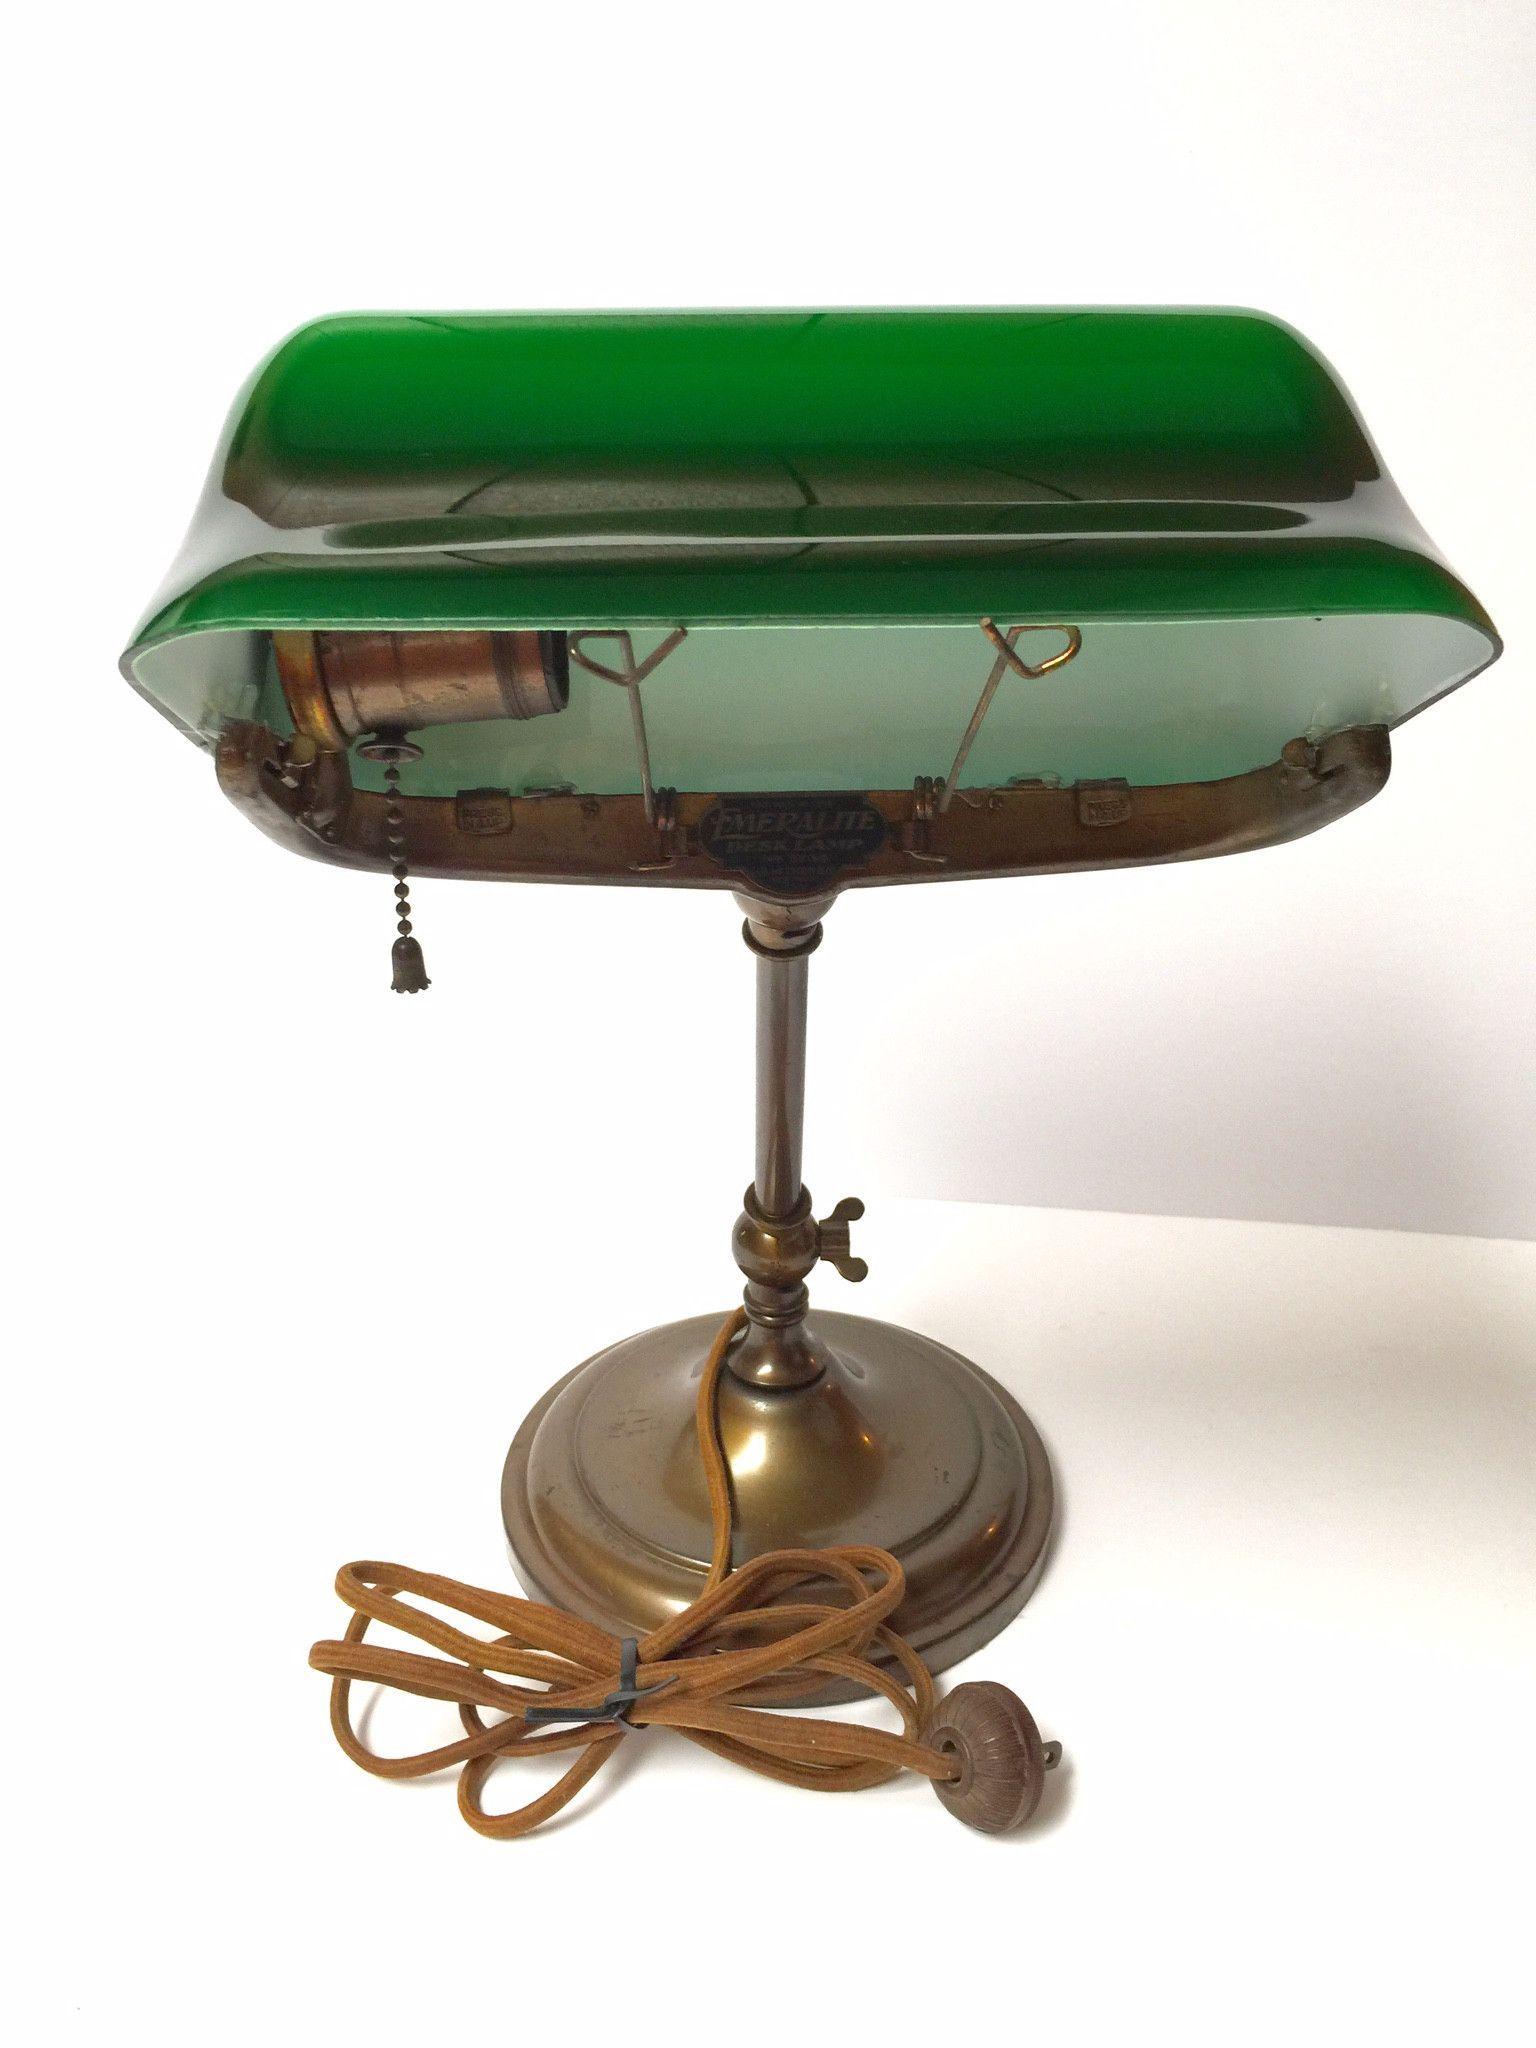 Emeralite Desk Banker\u0027s Lamp 8734 McFaddin Co. Circa 1916 Original ...